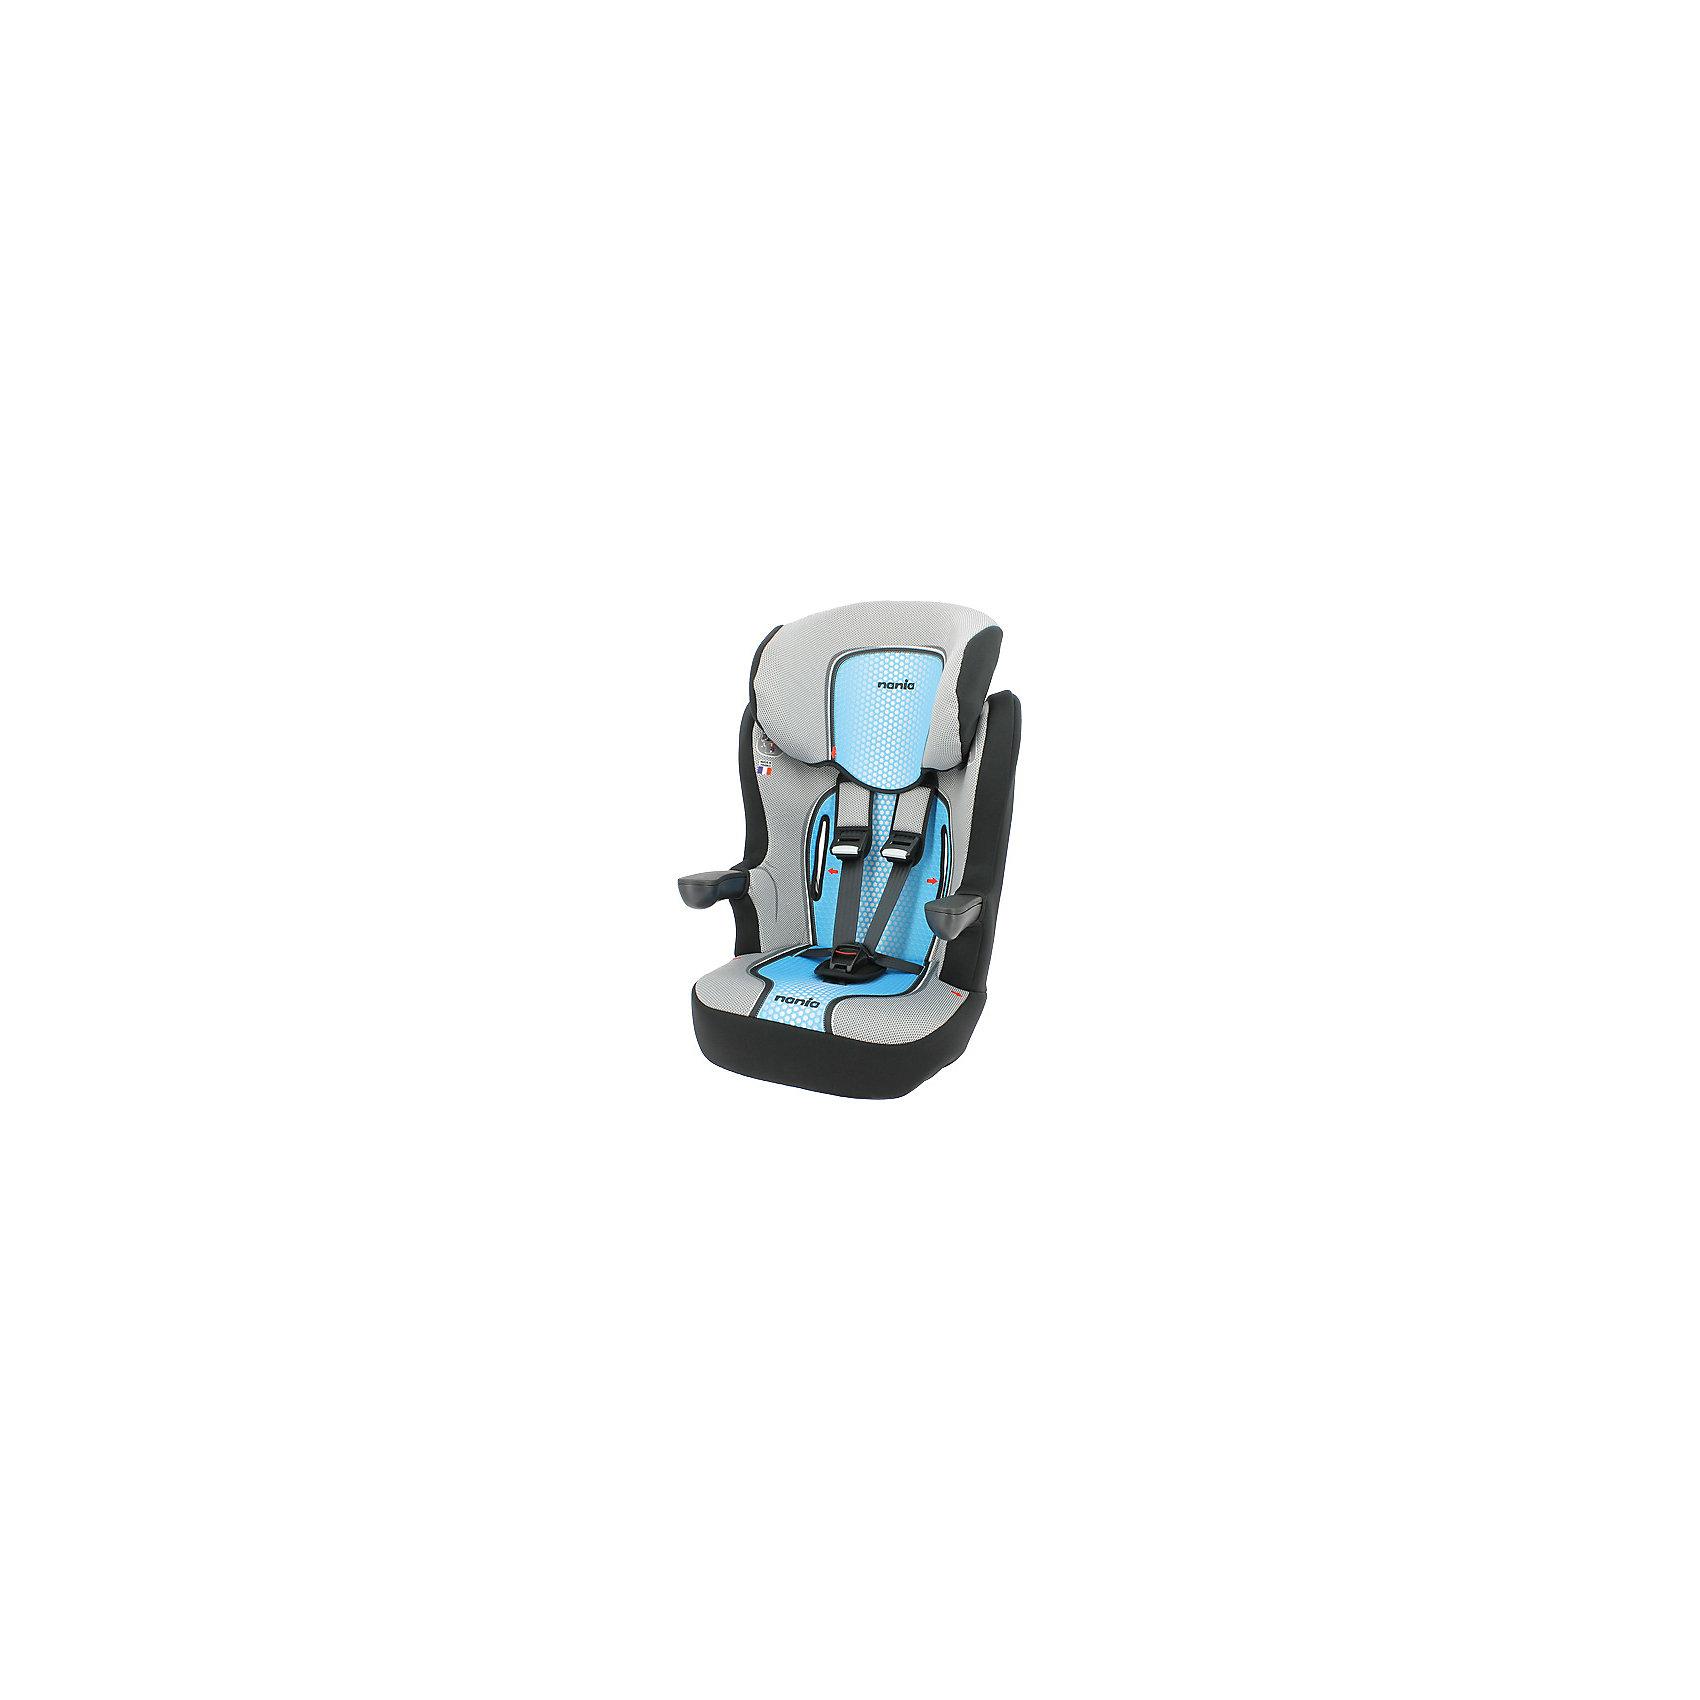 Автокресло Nania Imax SP FST 9-36 кг, pop blue